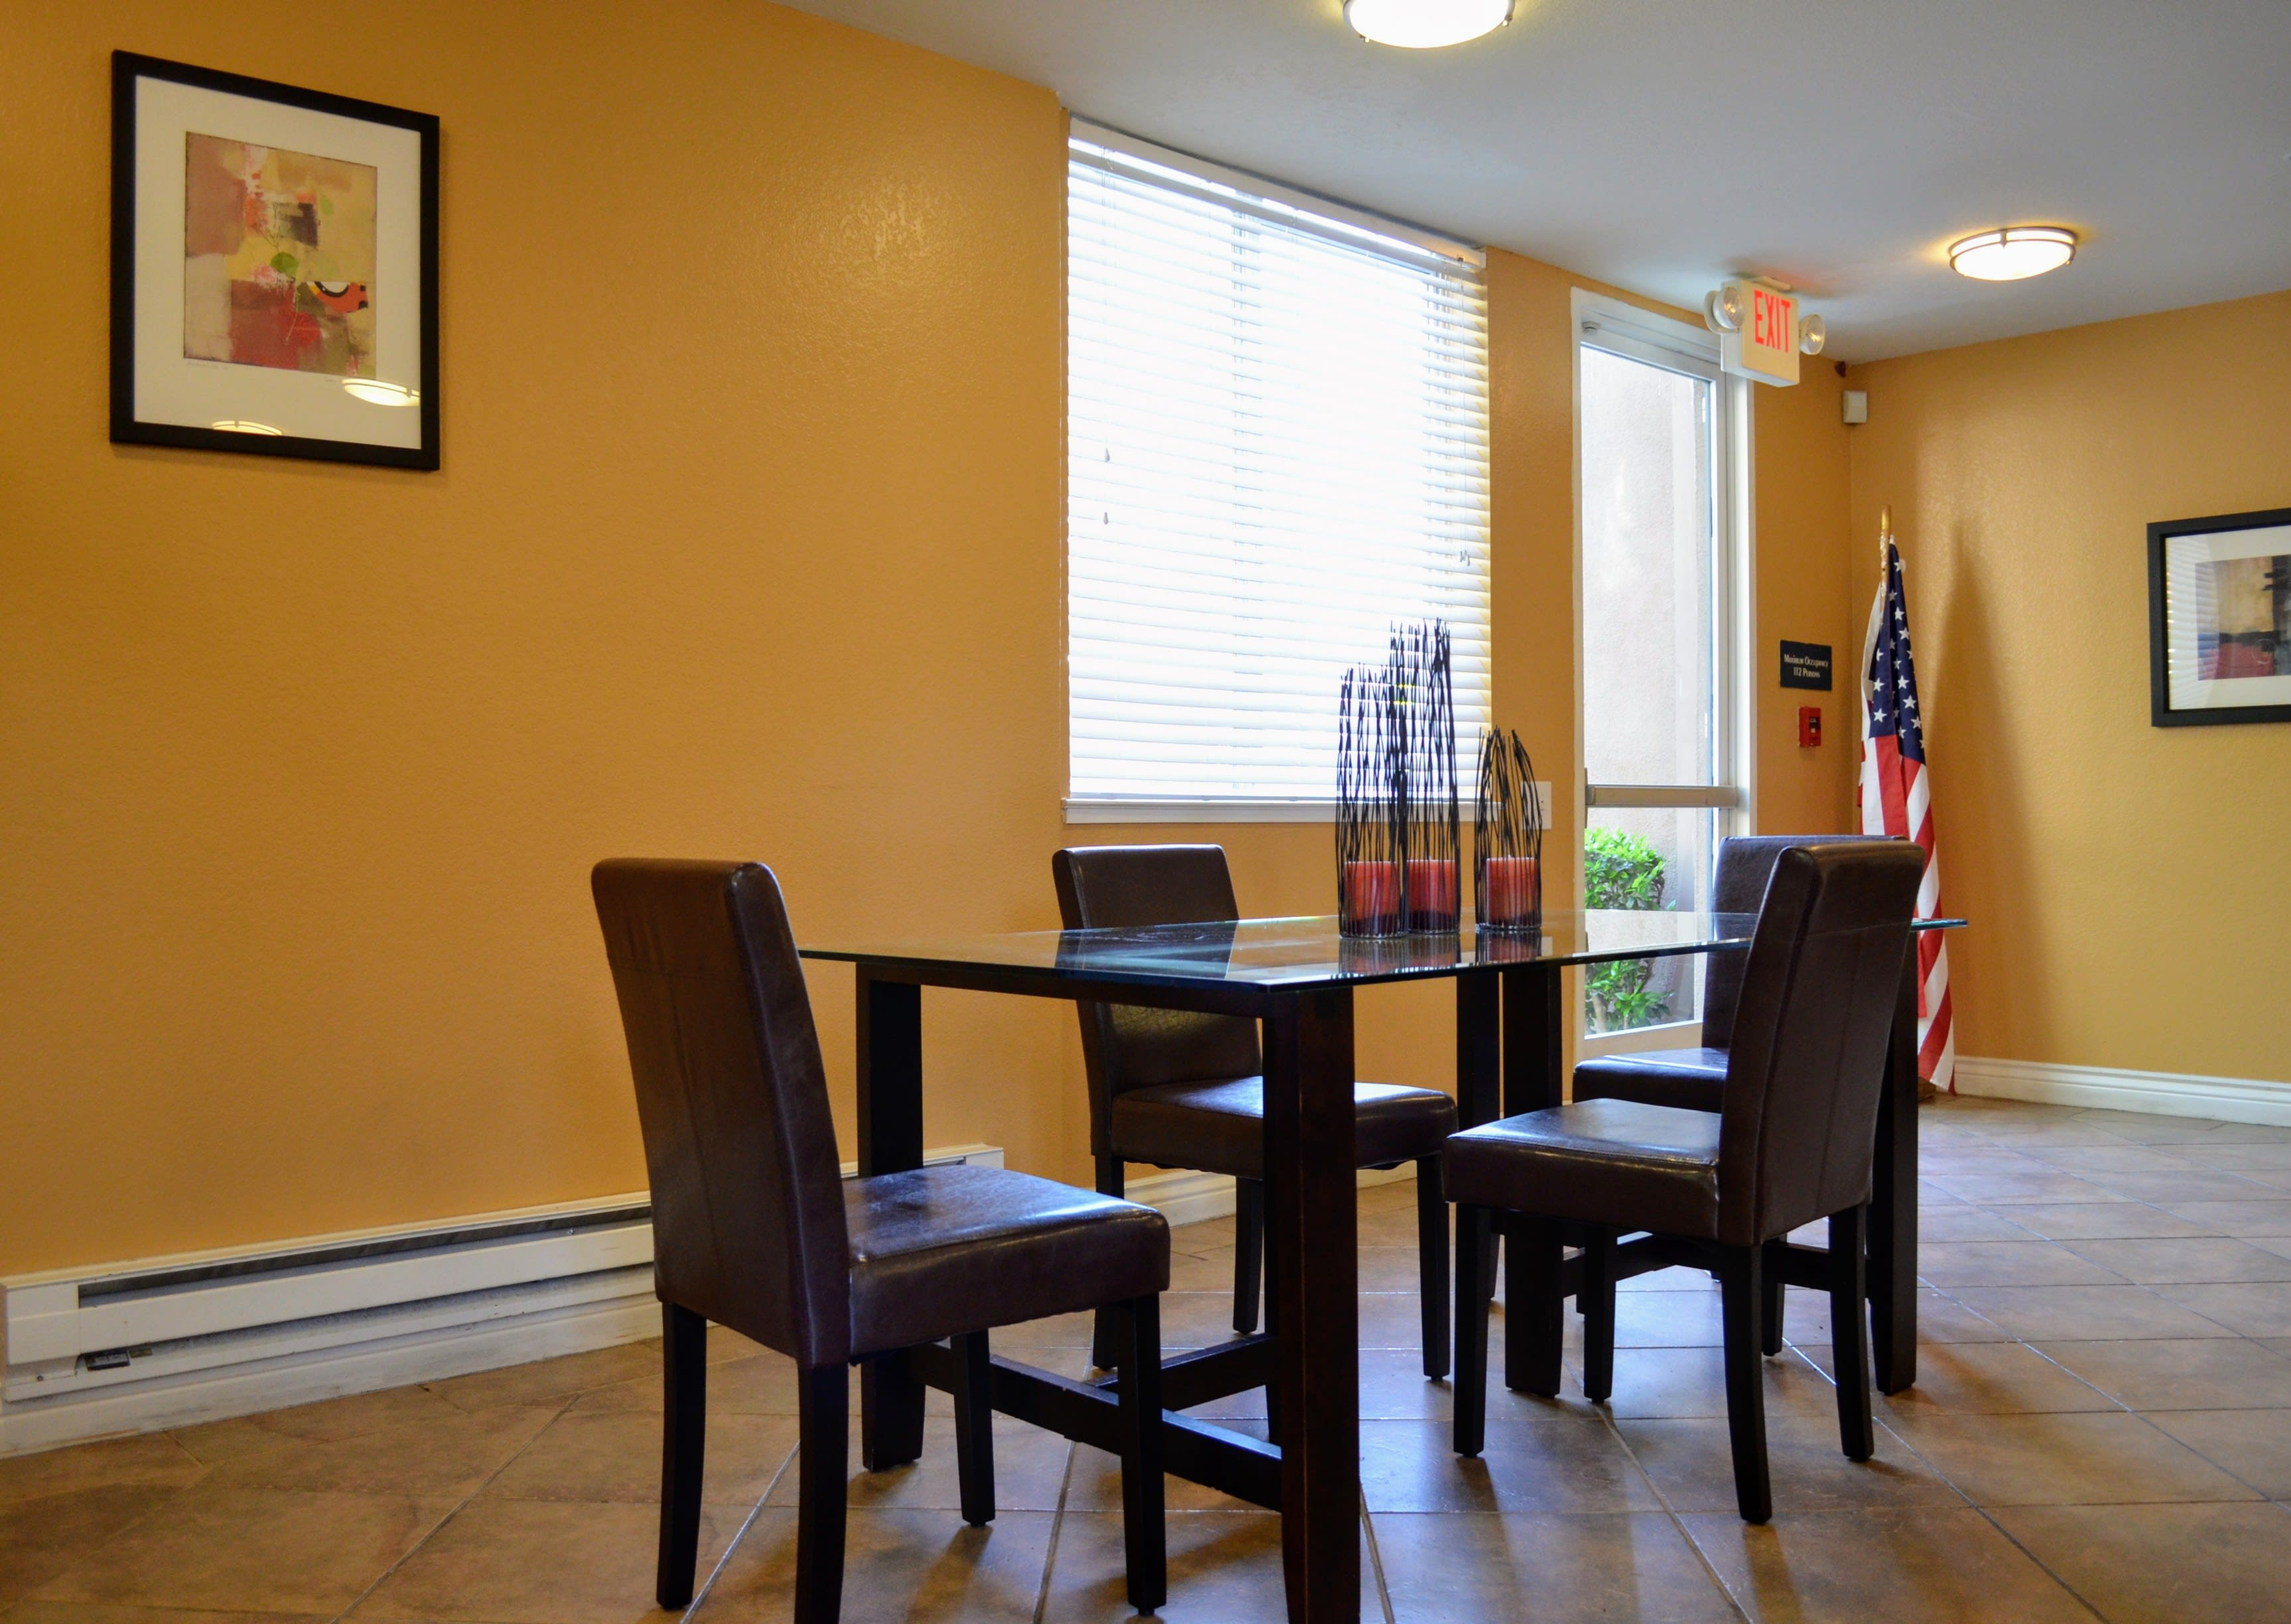 Separate Spaces for Dining at Del Norte Place Apartments, 11720 San Pablo Avenue, El Cerrito